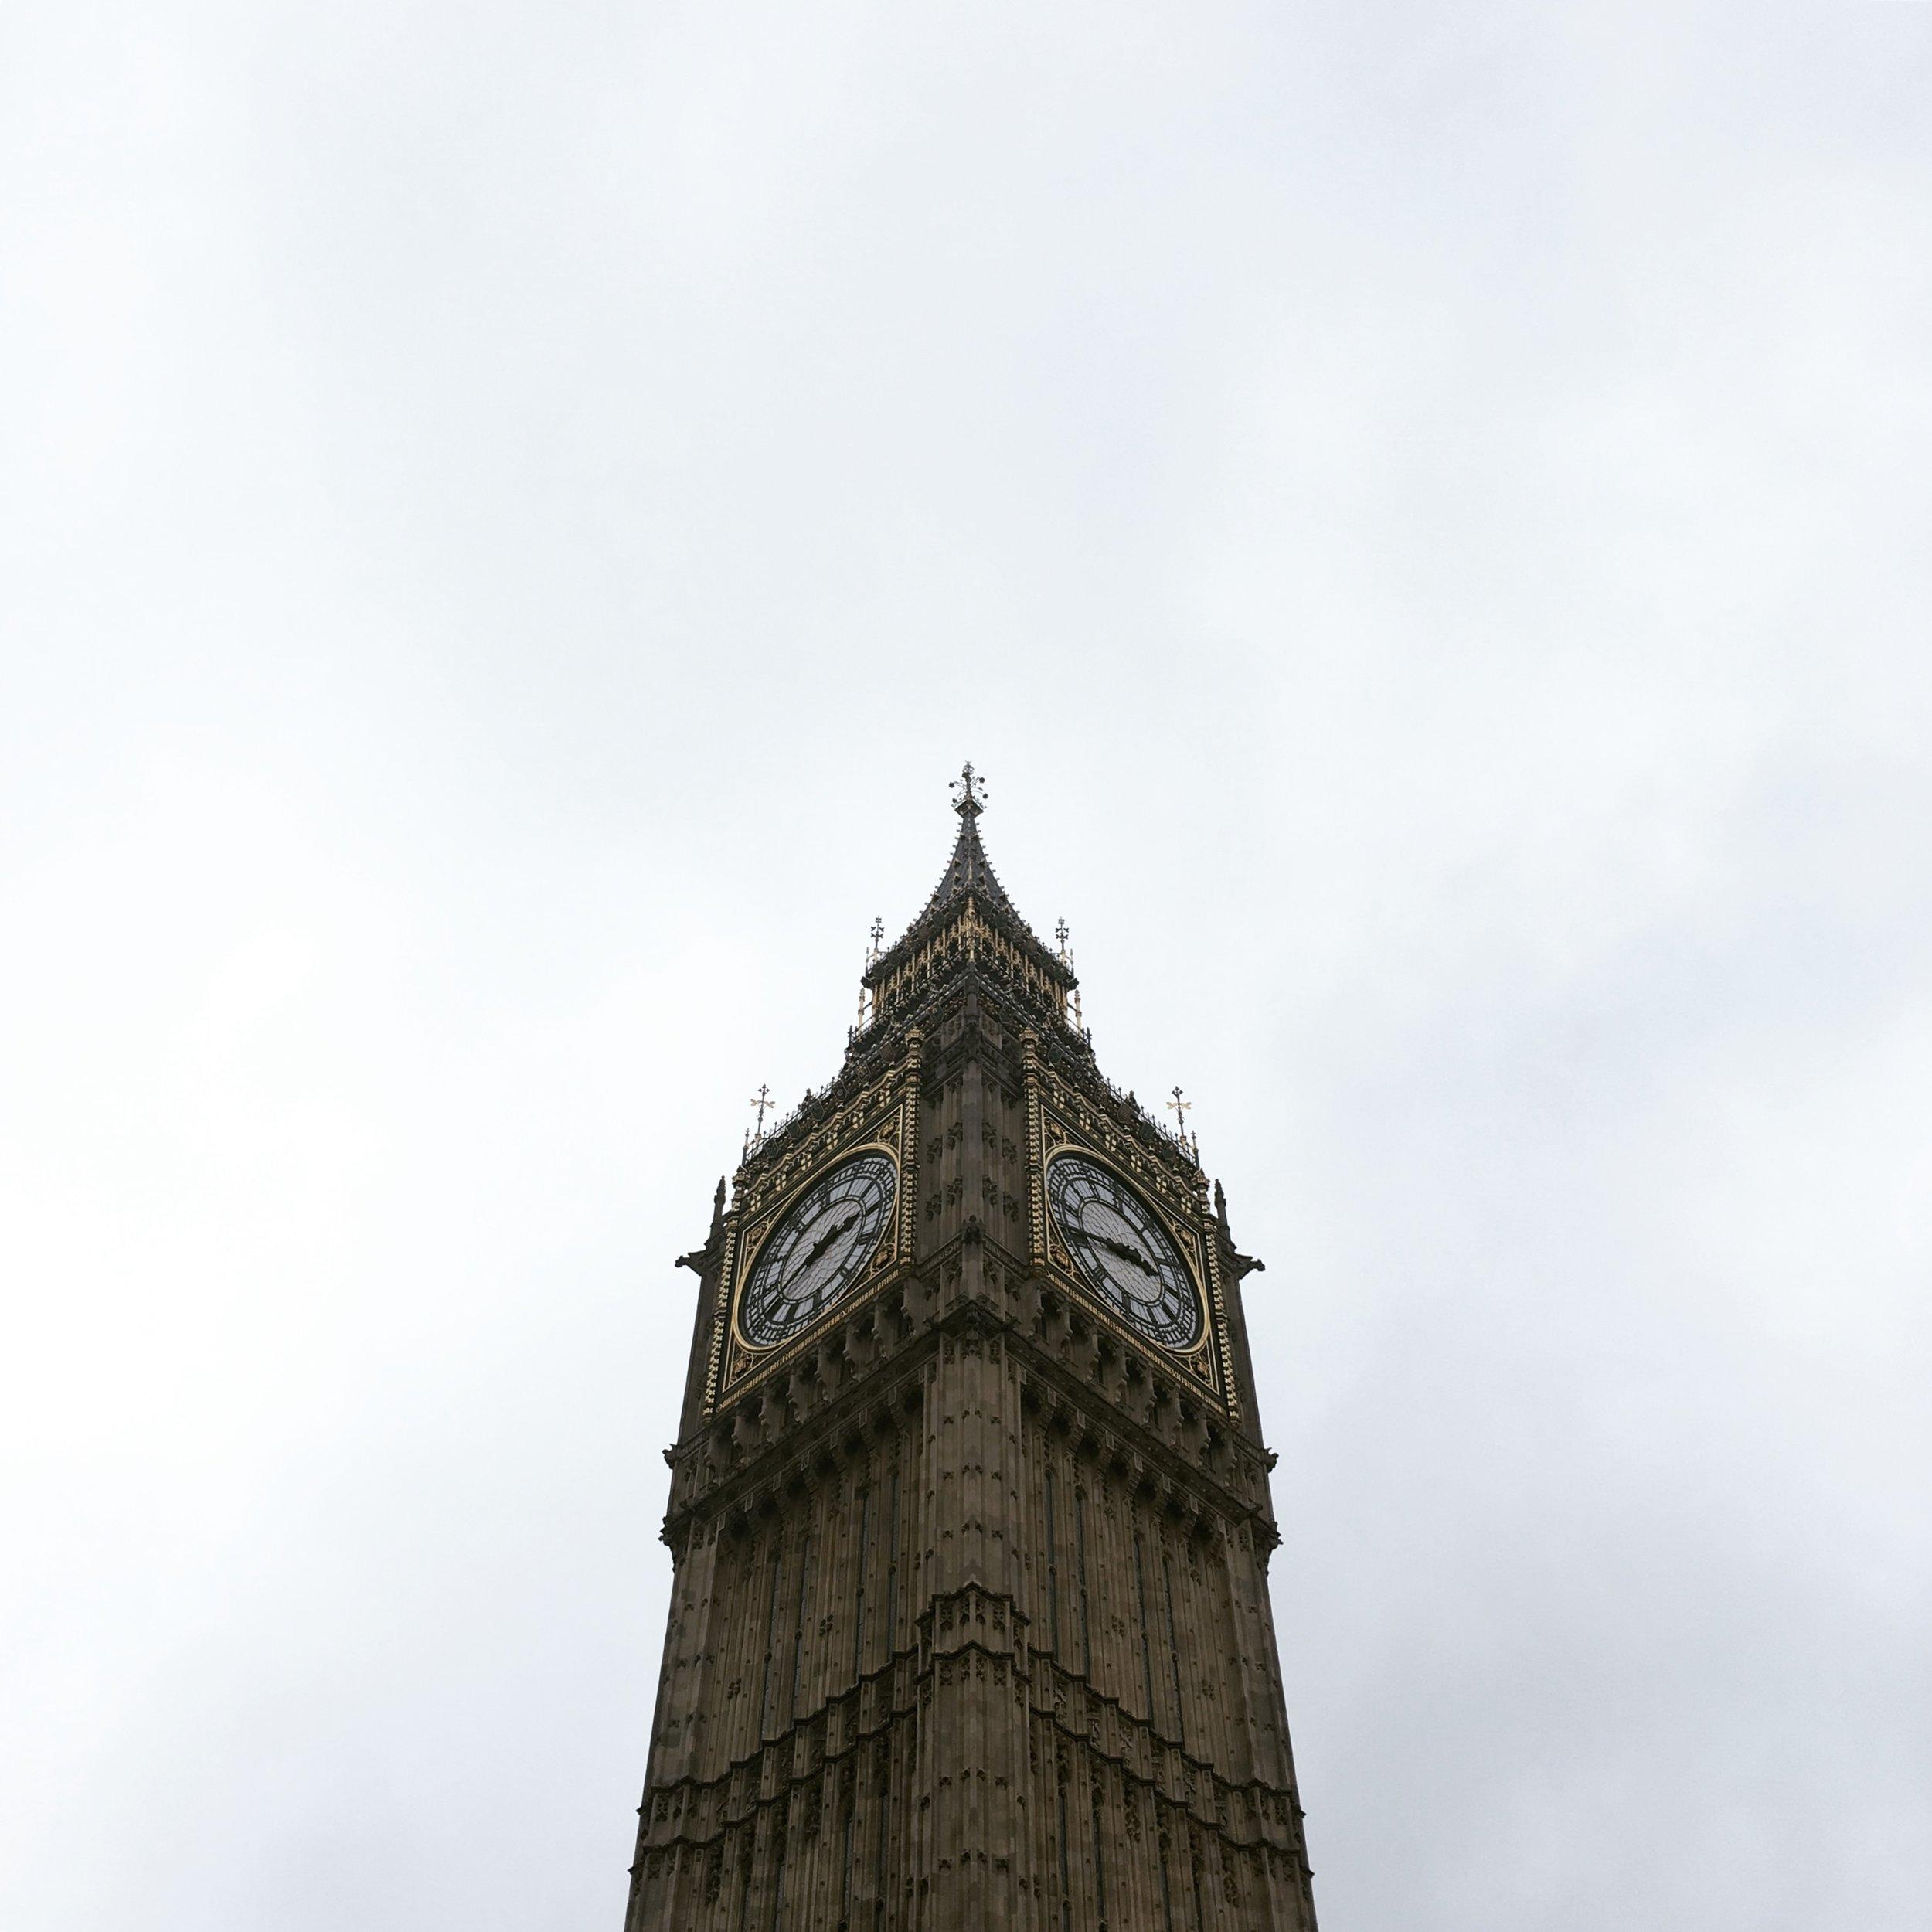 Lozidaze_London-Big-Ben